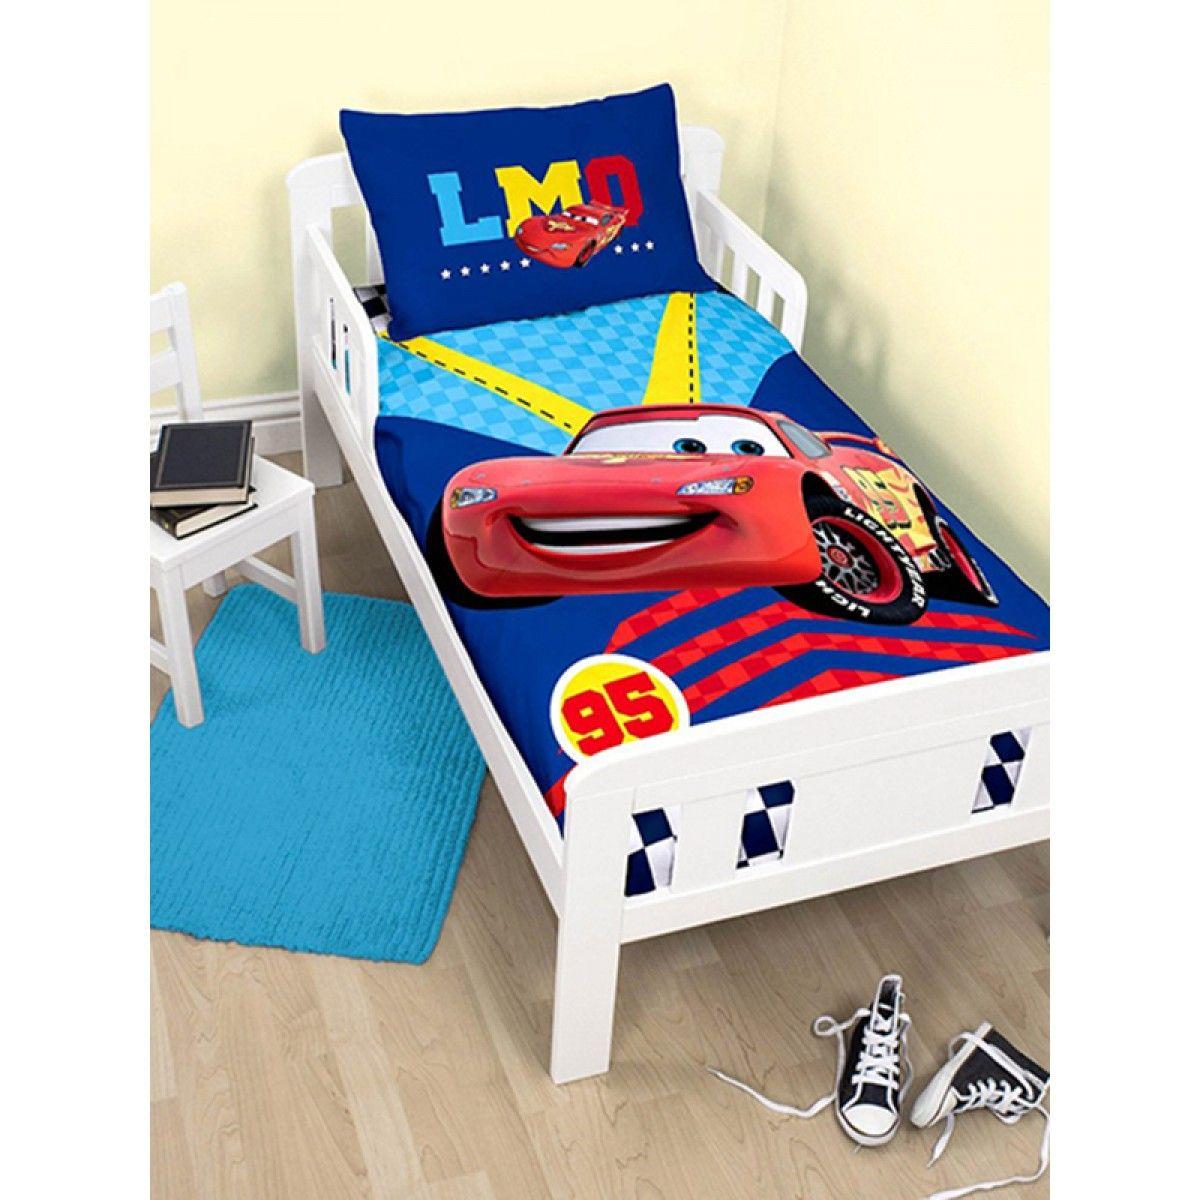 Null Toddler duvet, Toddler bed mattress, Toddler quilt